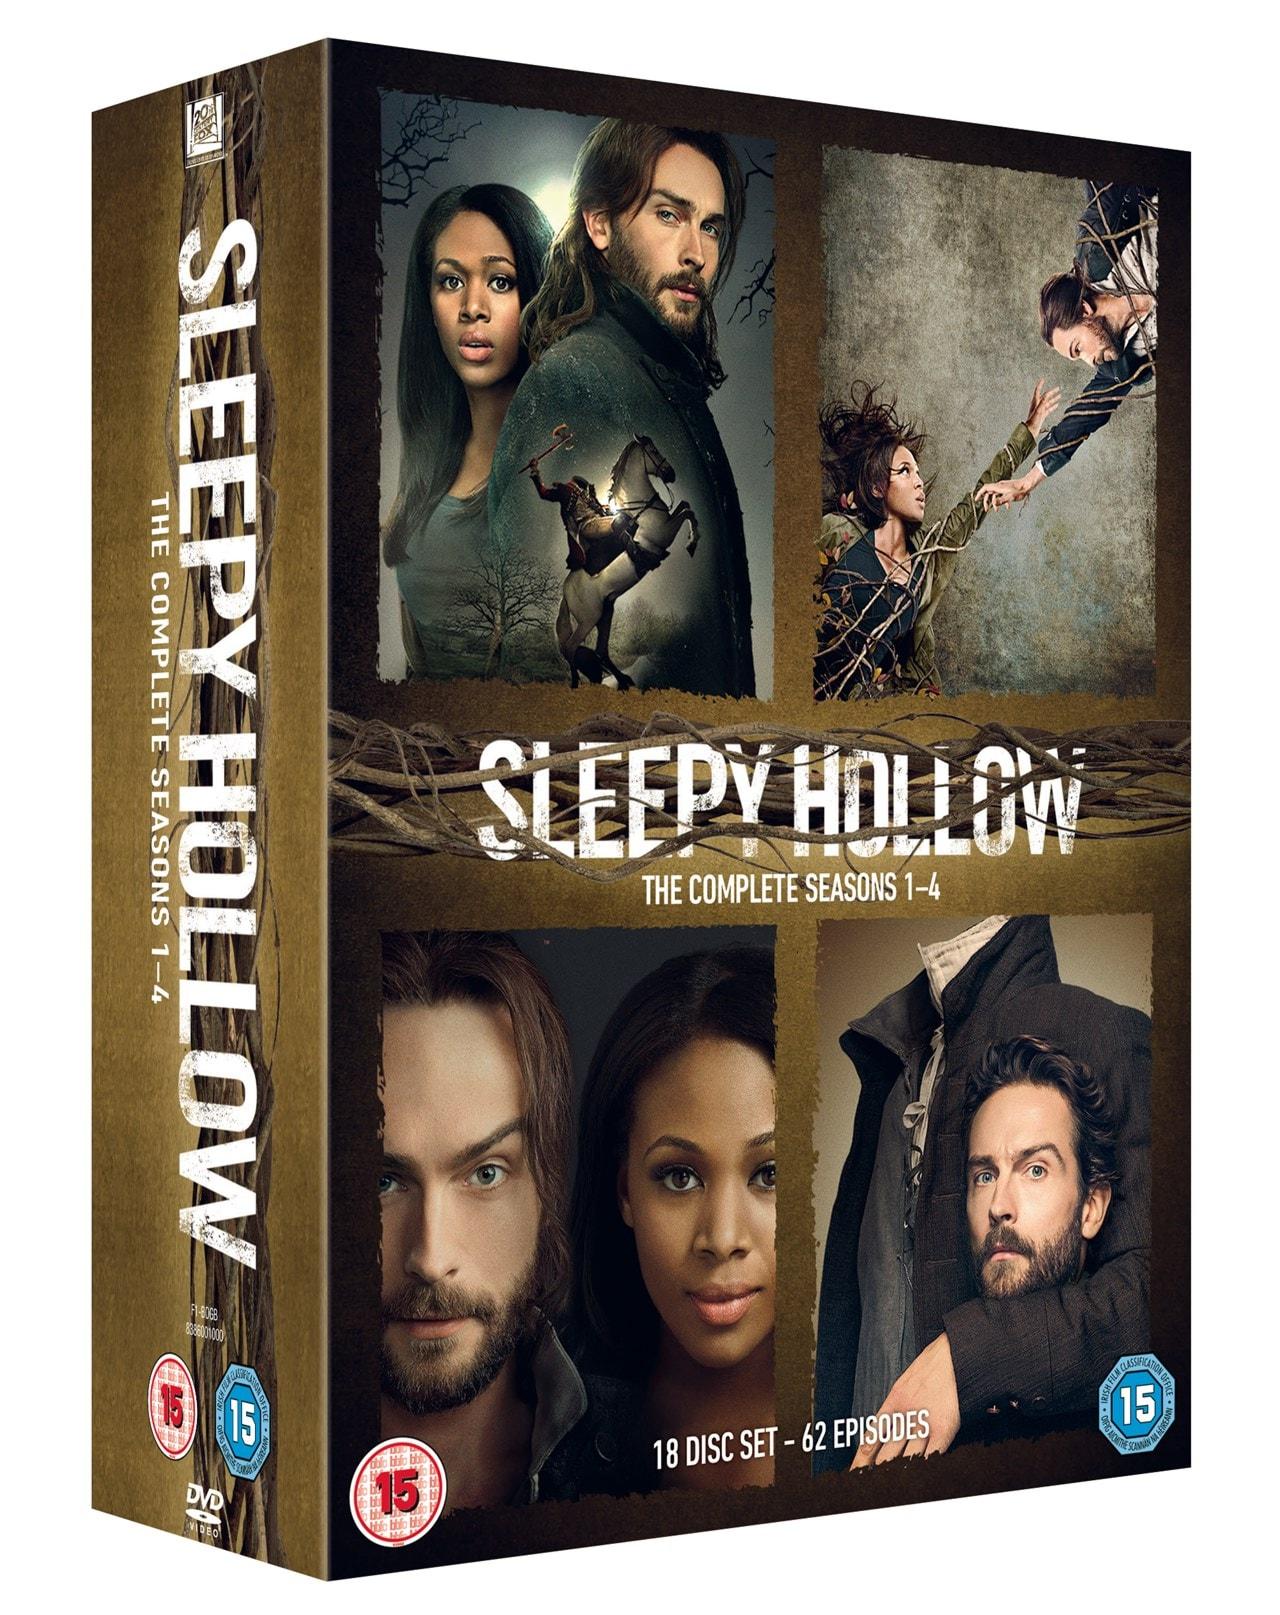 Sleepy Hollow: The Complete Seasons 1-4 - 2